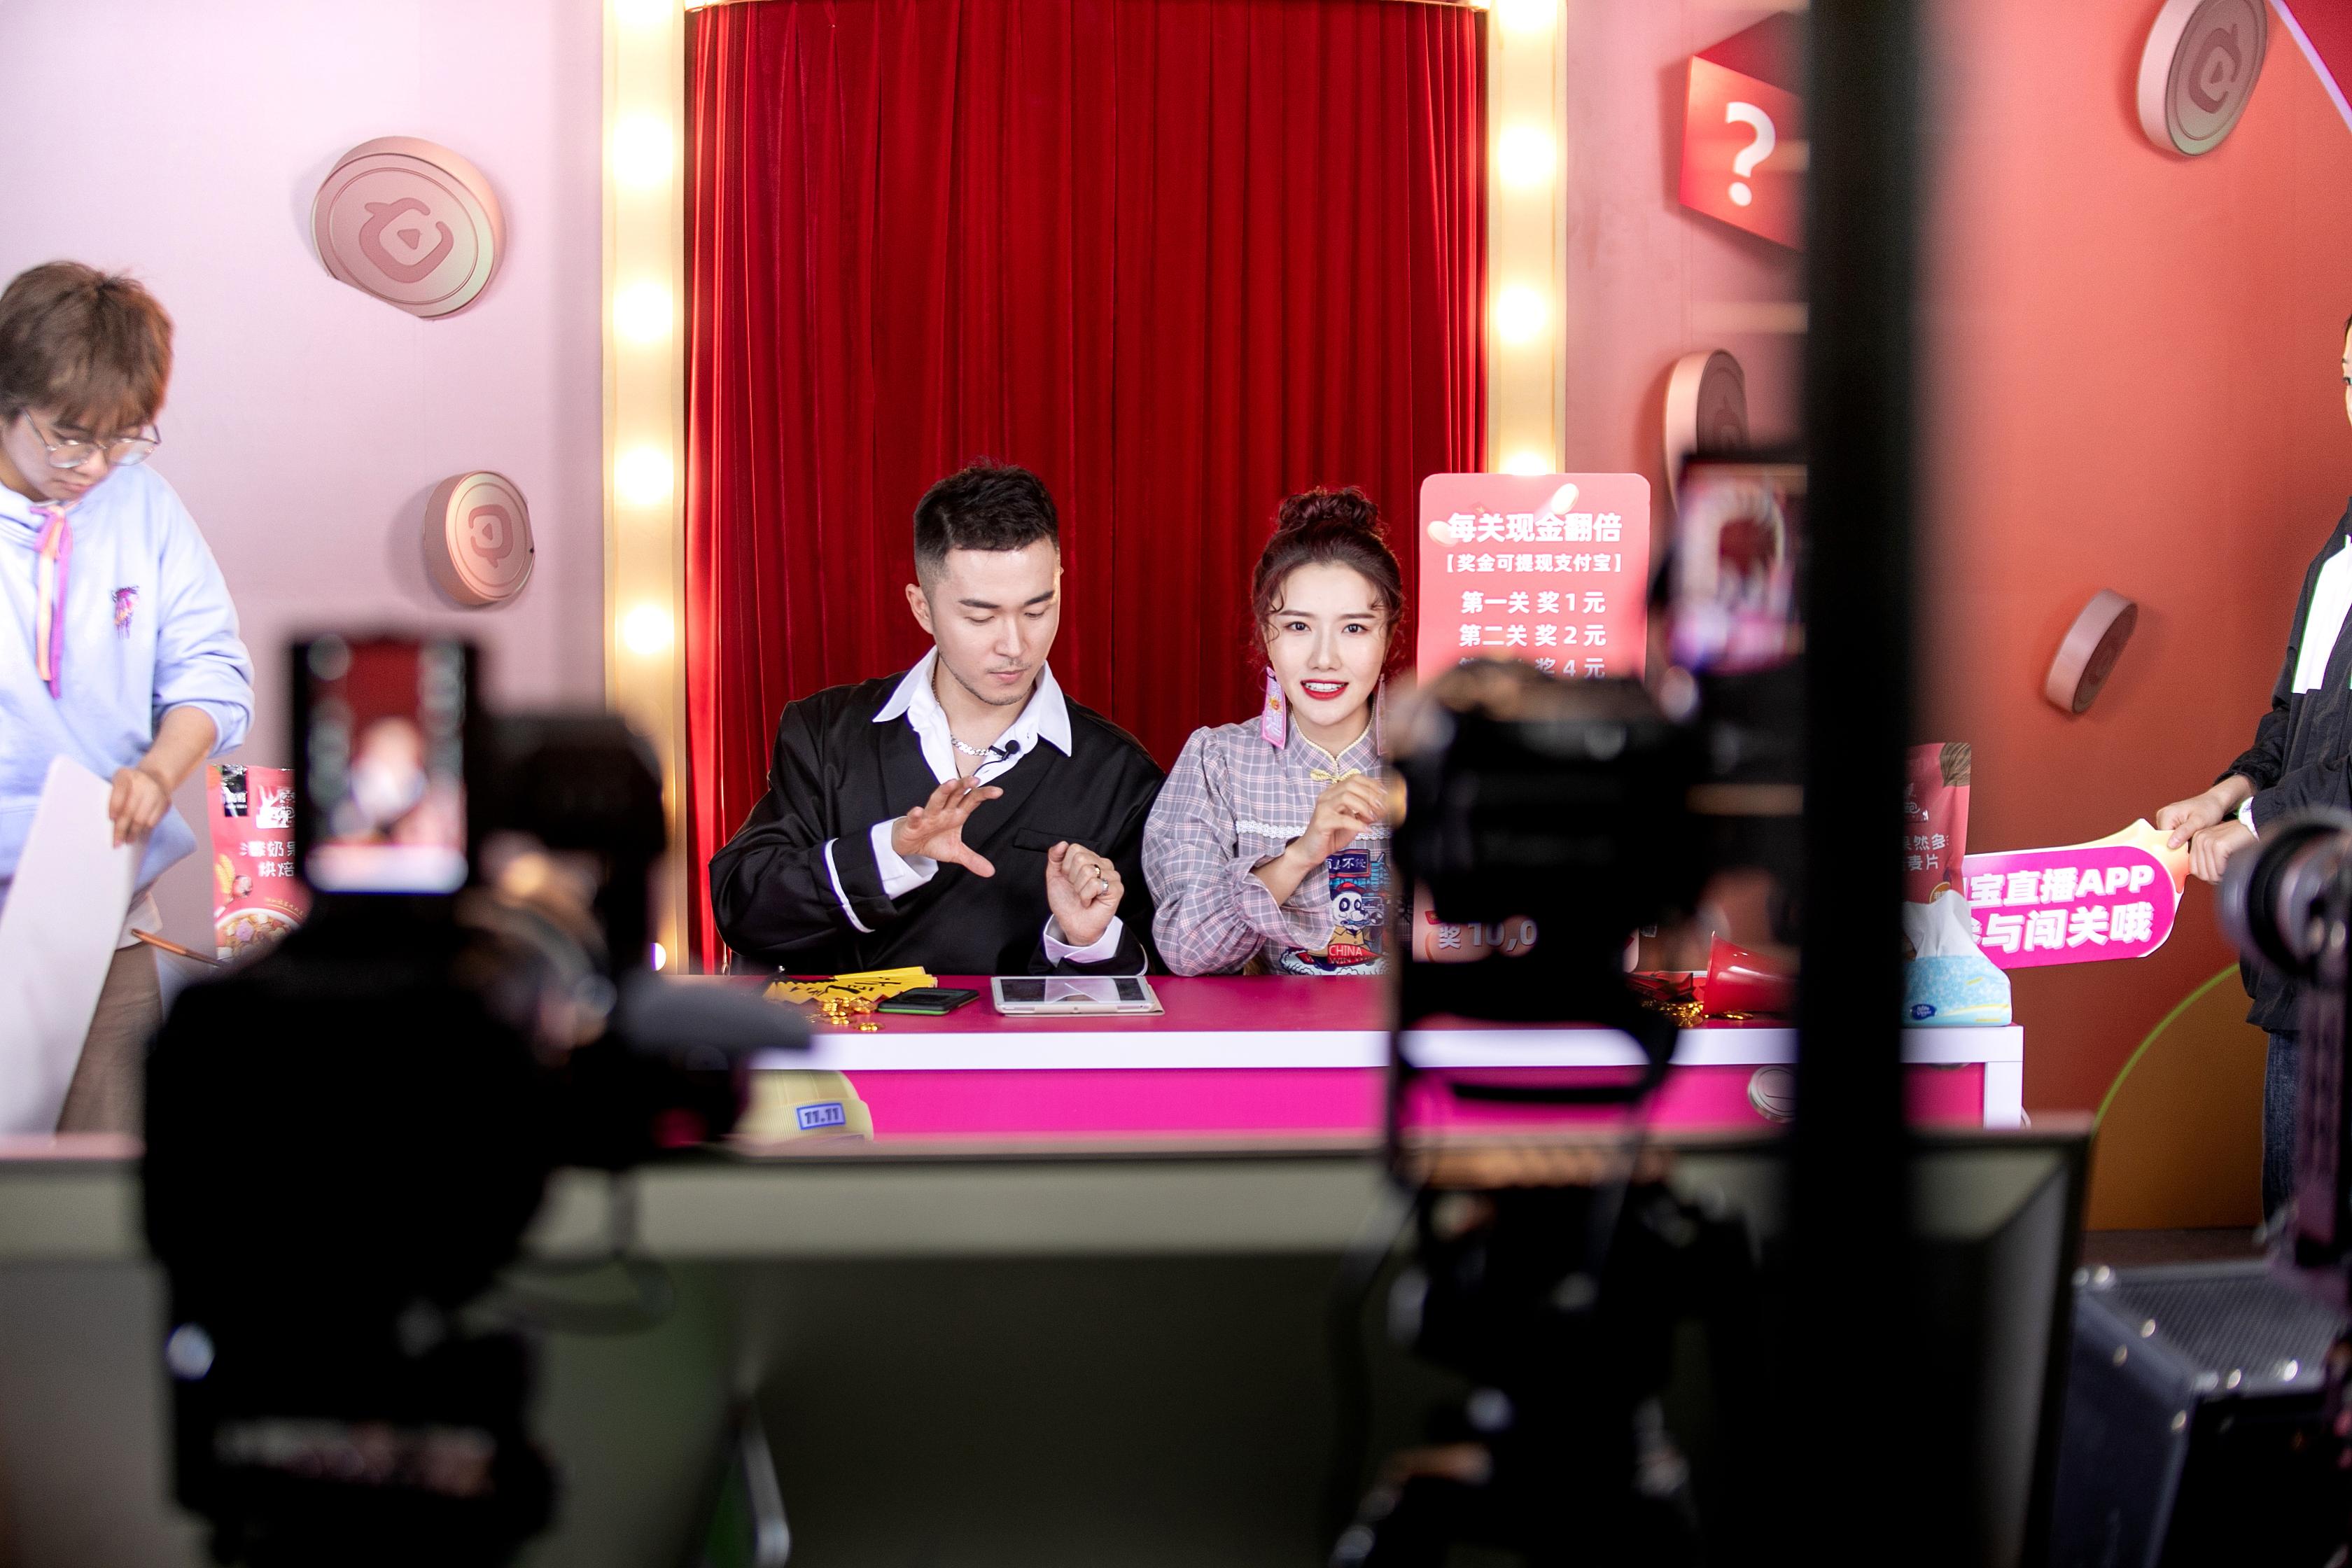 teknologi livestreaming e-commerce Alibaba - featured